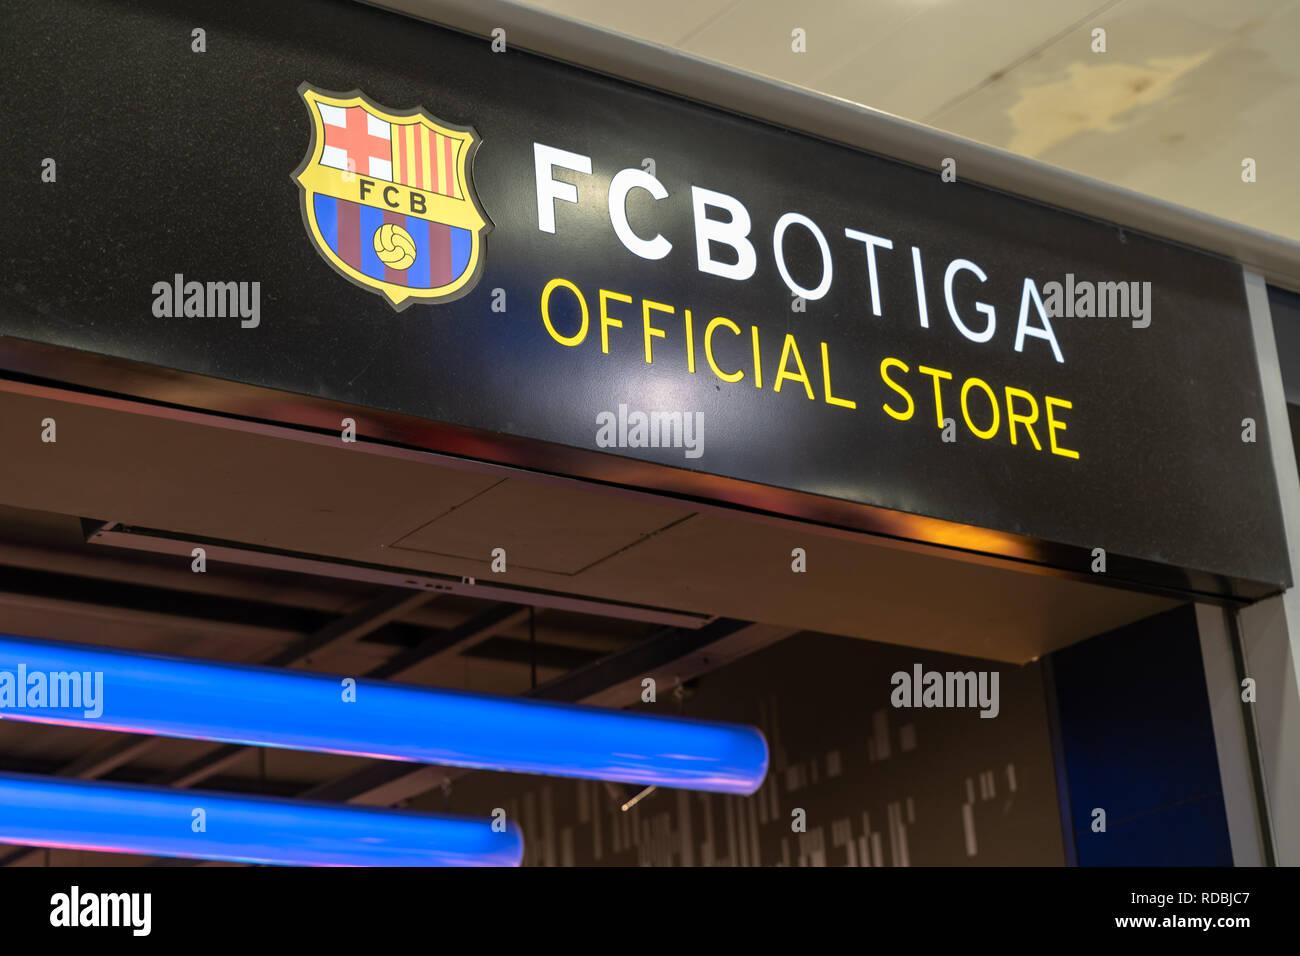 Entrance, facade to the fc botiga store of the fc barcelona footbal.  Logo fc barcelona, Spain - Stock Image